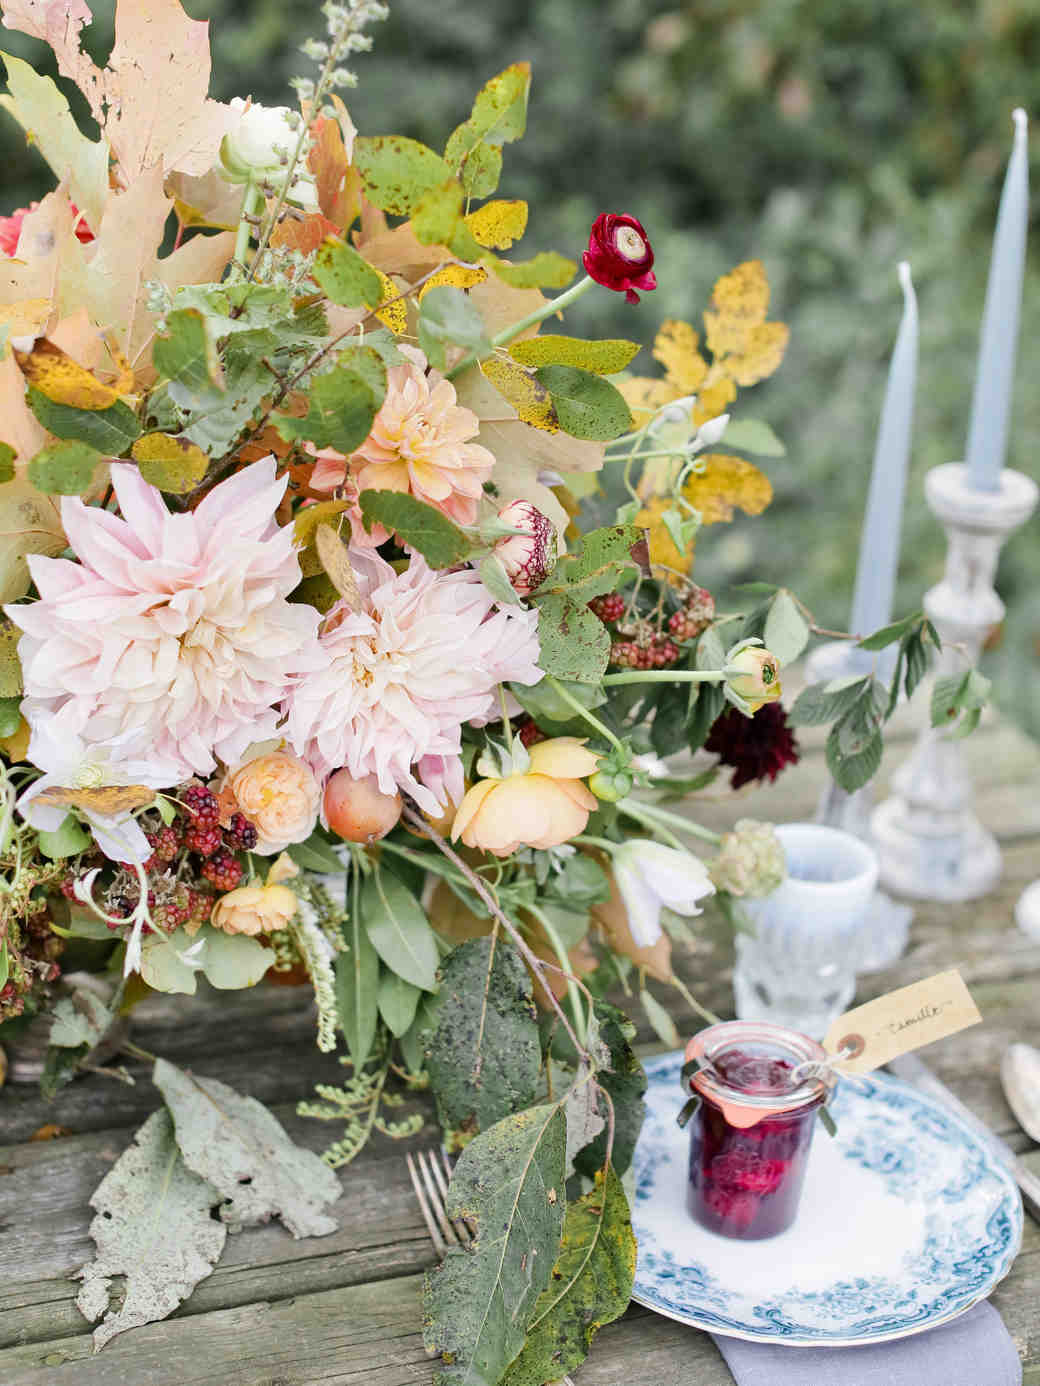 poppies-posies-thanksgiving-table-1116.jpg (skyword:358450)